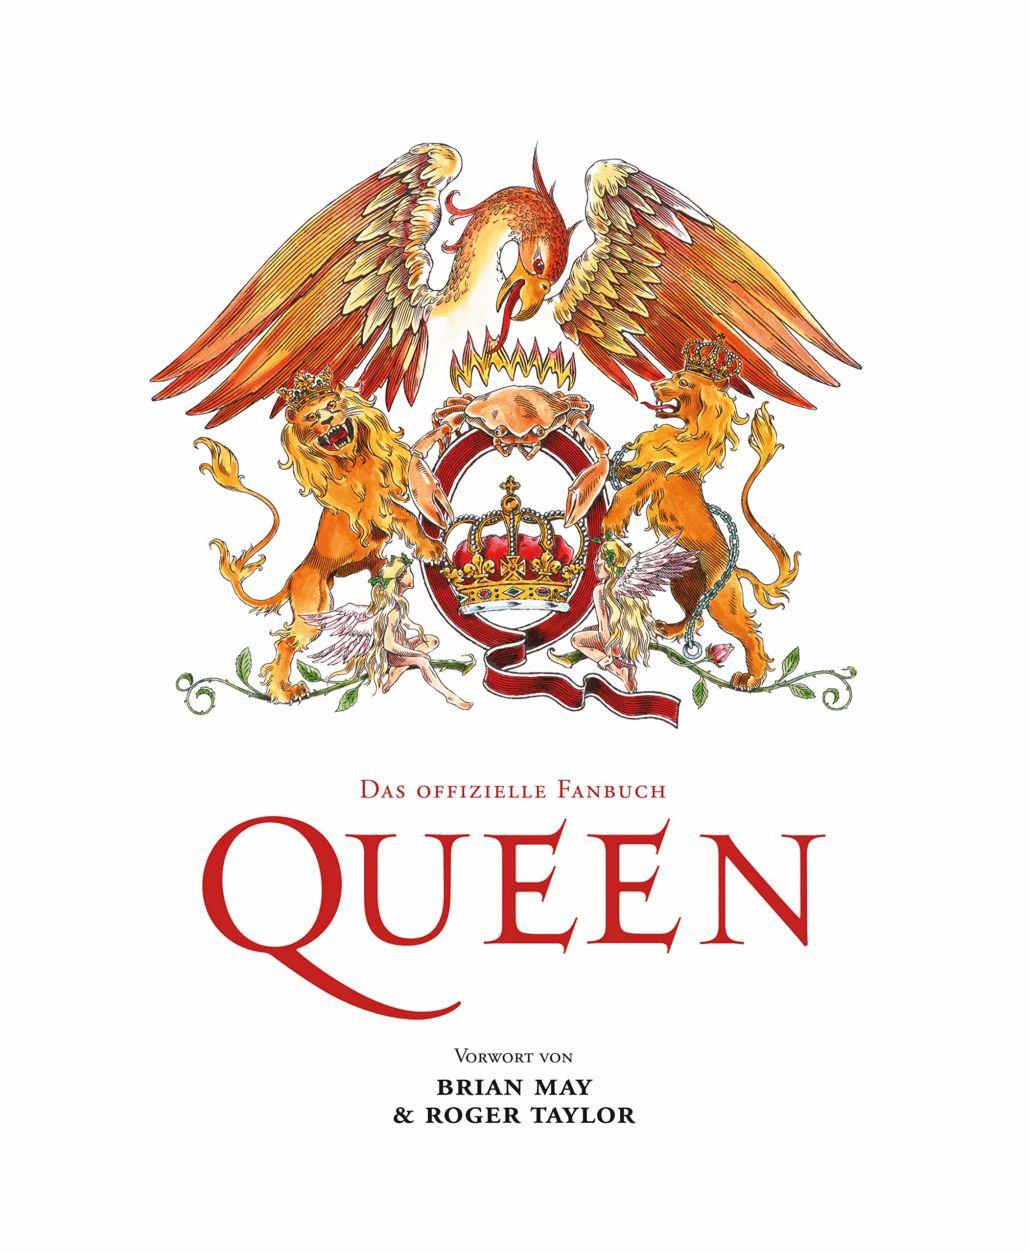 QUEEN: Das offizielle Fanbuch – Freddie Mercury & Co.